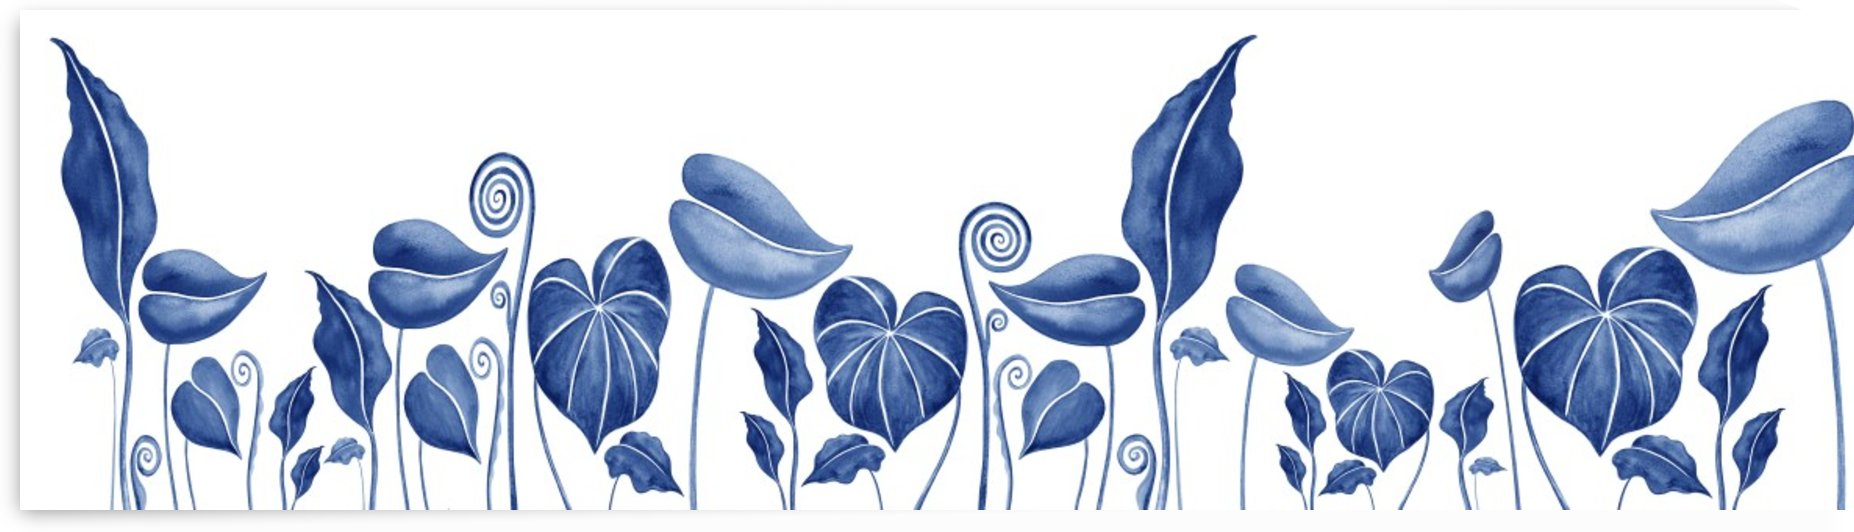 Blue Exotic Botanical Leaves Watercolor  by Irina Sztukowski